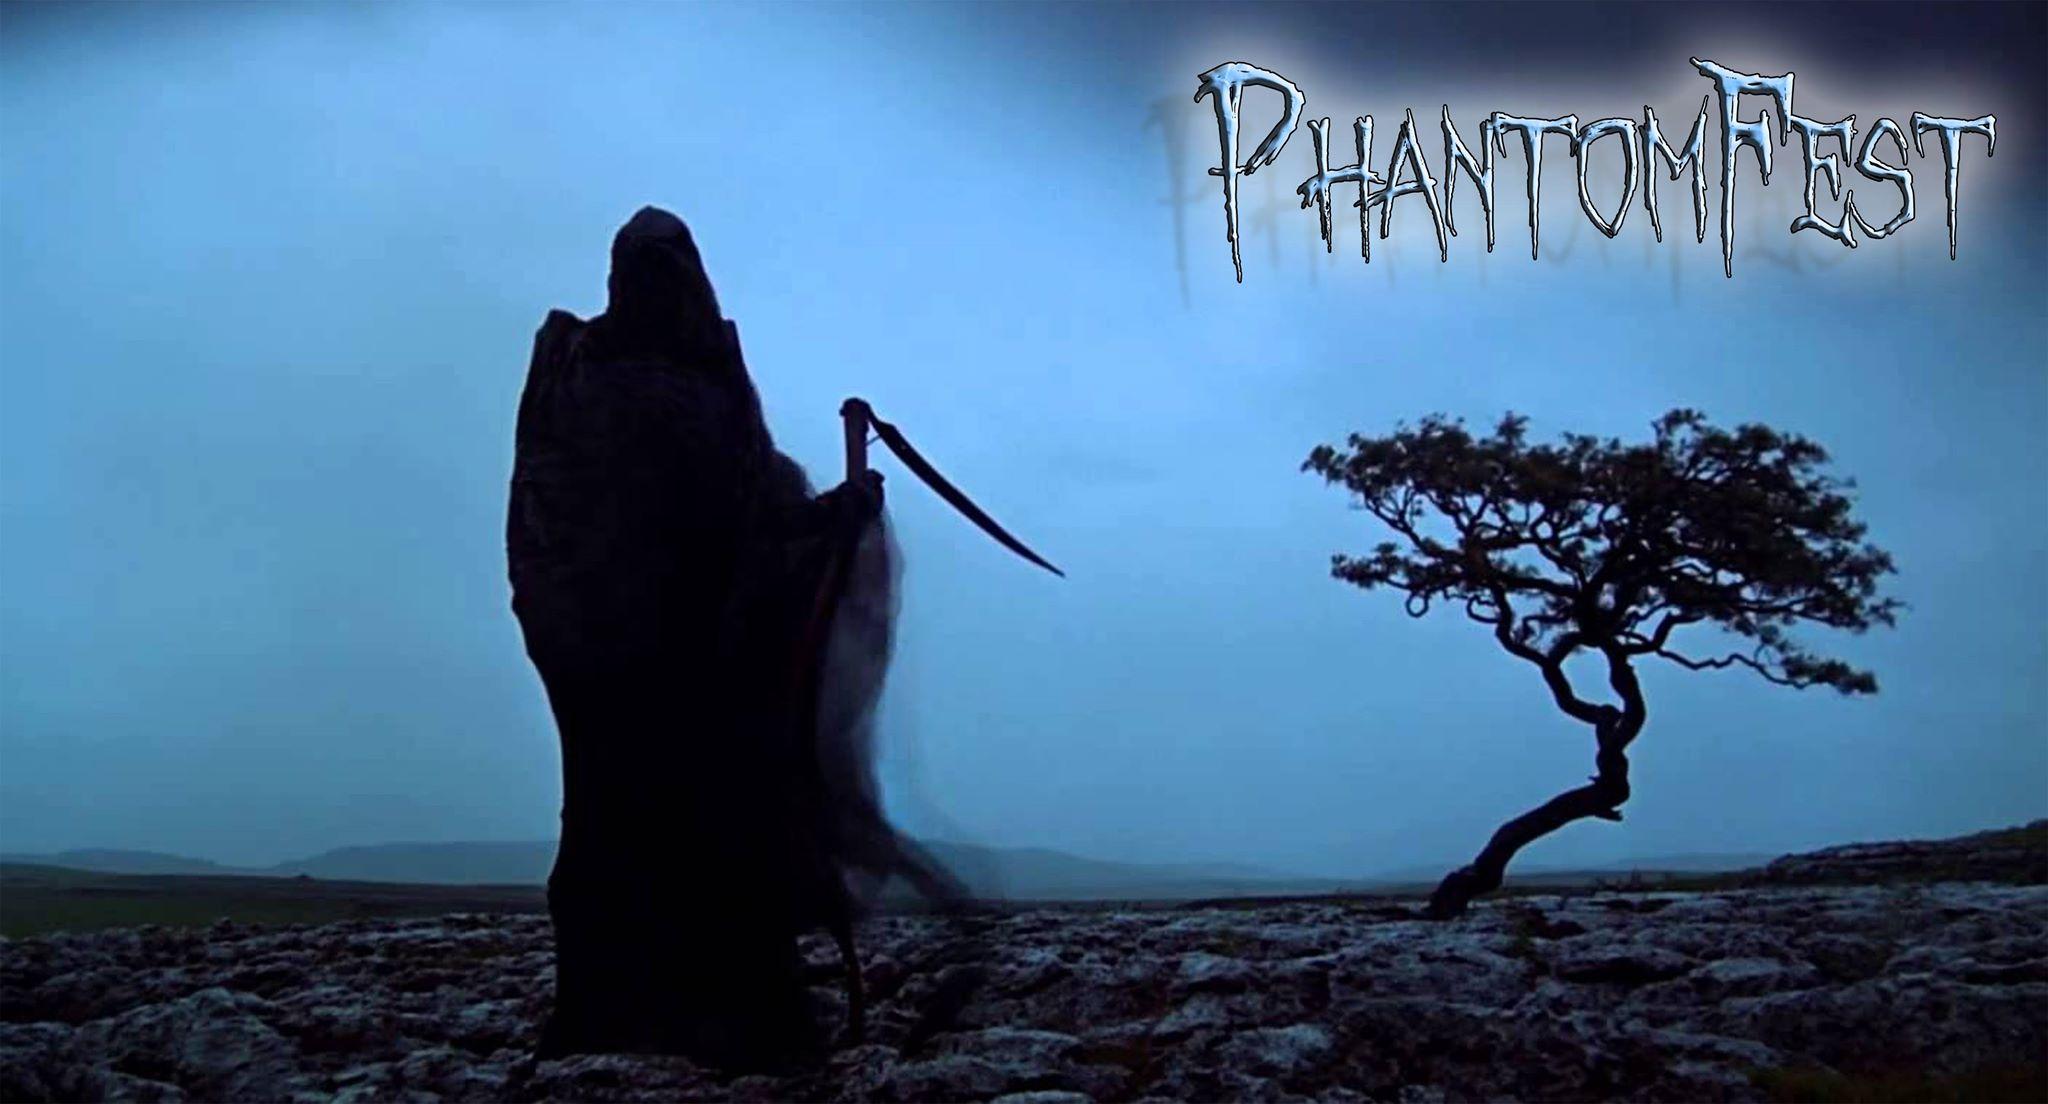 Phantom Fest